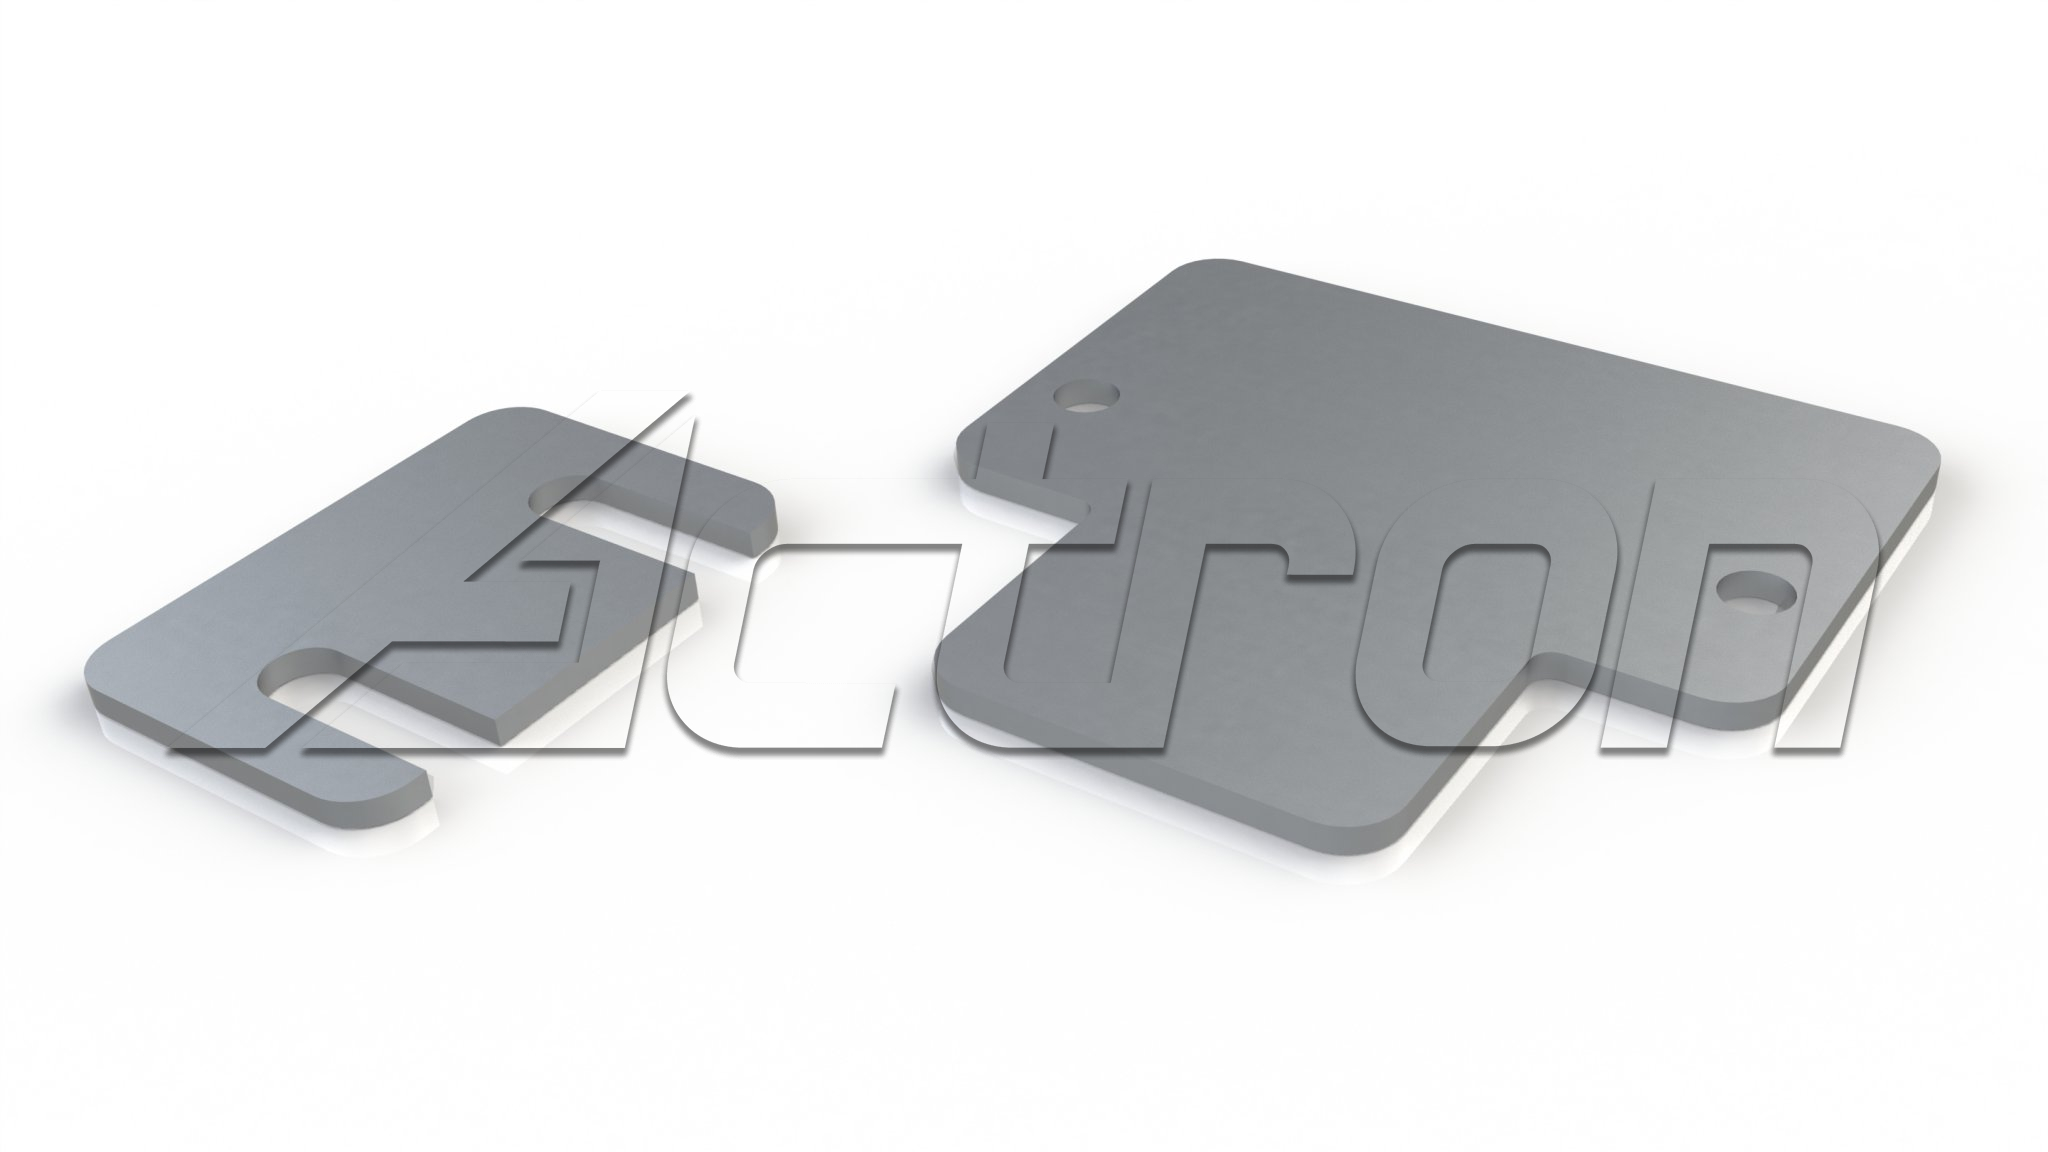 shim-8211-wire-strike-5663-a43032.jpg